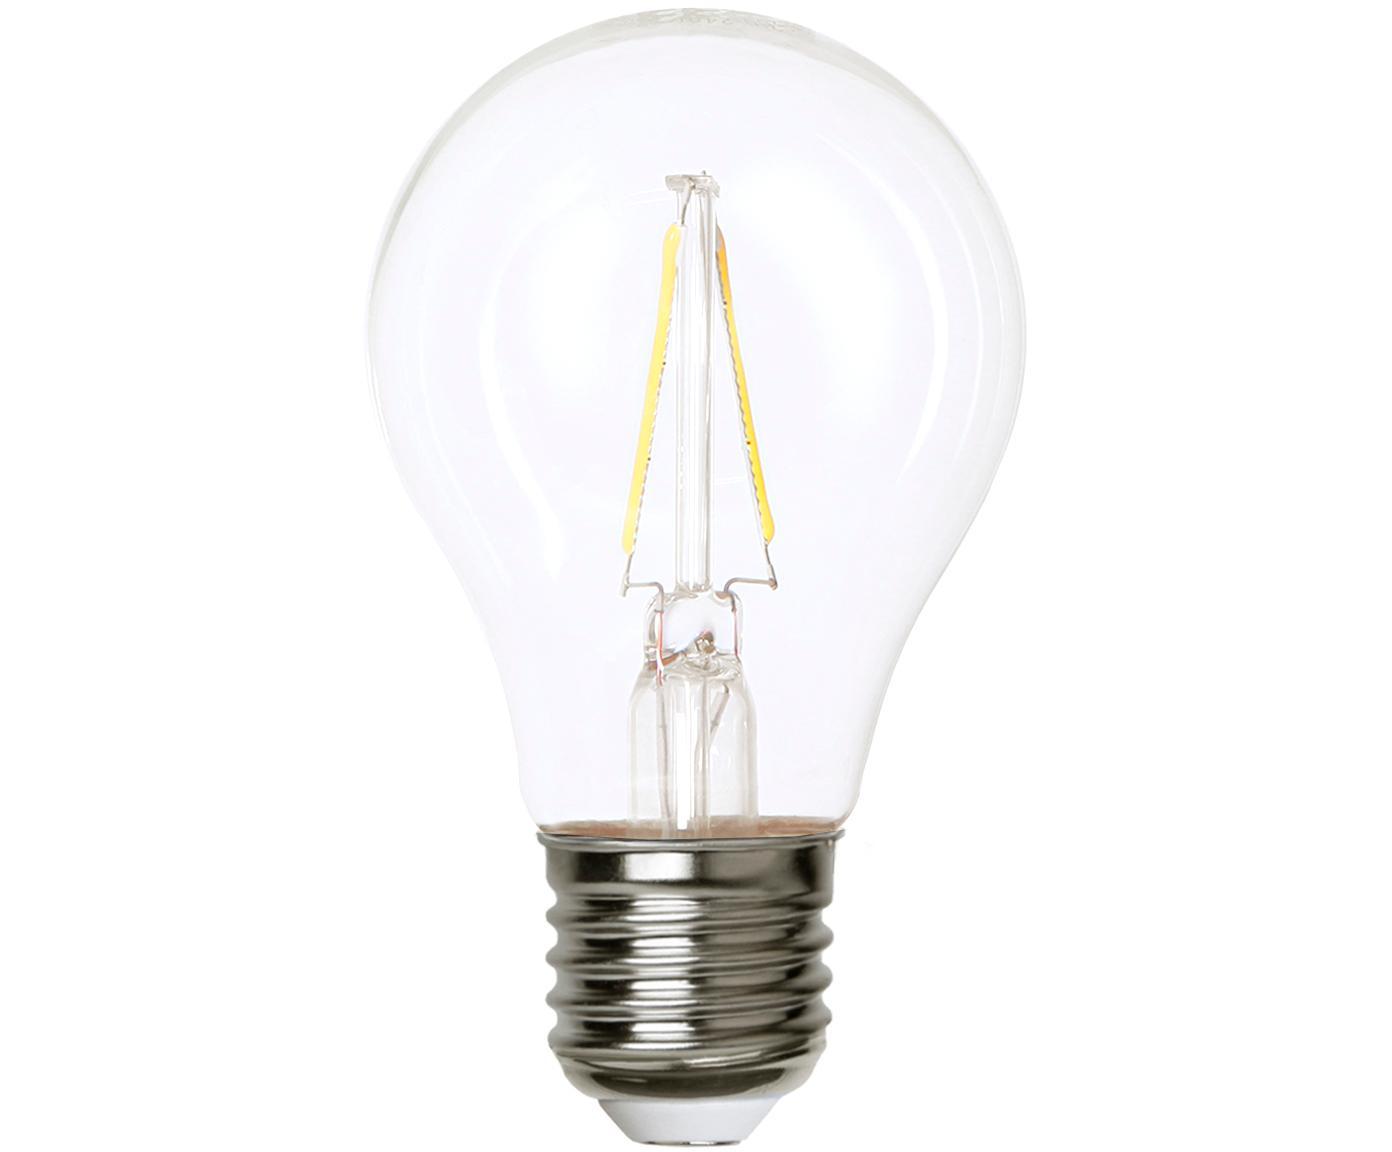 Lampadine a LED Airtight Two (E27 / 2Watt) 5 pz, Paralume: vetro, Base lampadina: rame, nichelato, Trasparente, nichel, Ø 6 x Alt. 11 cm